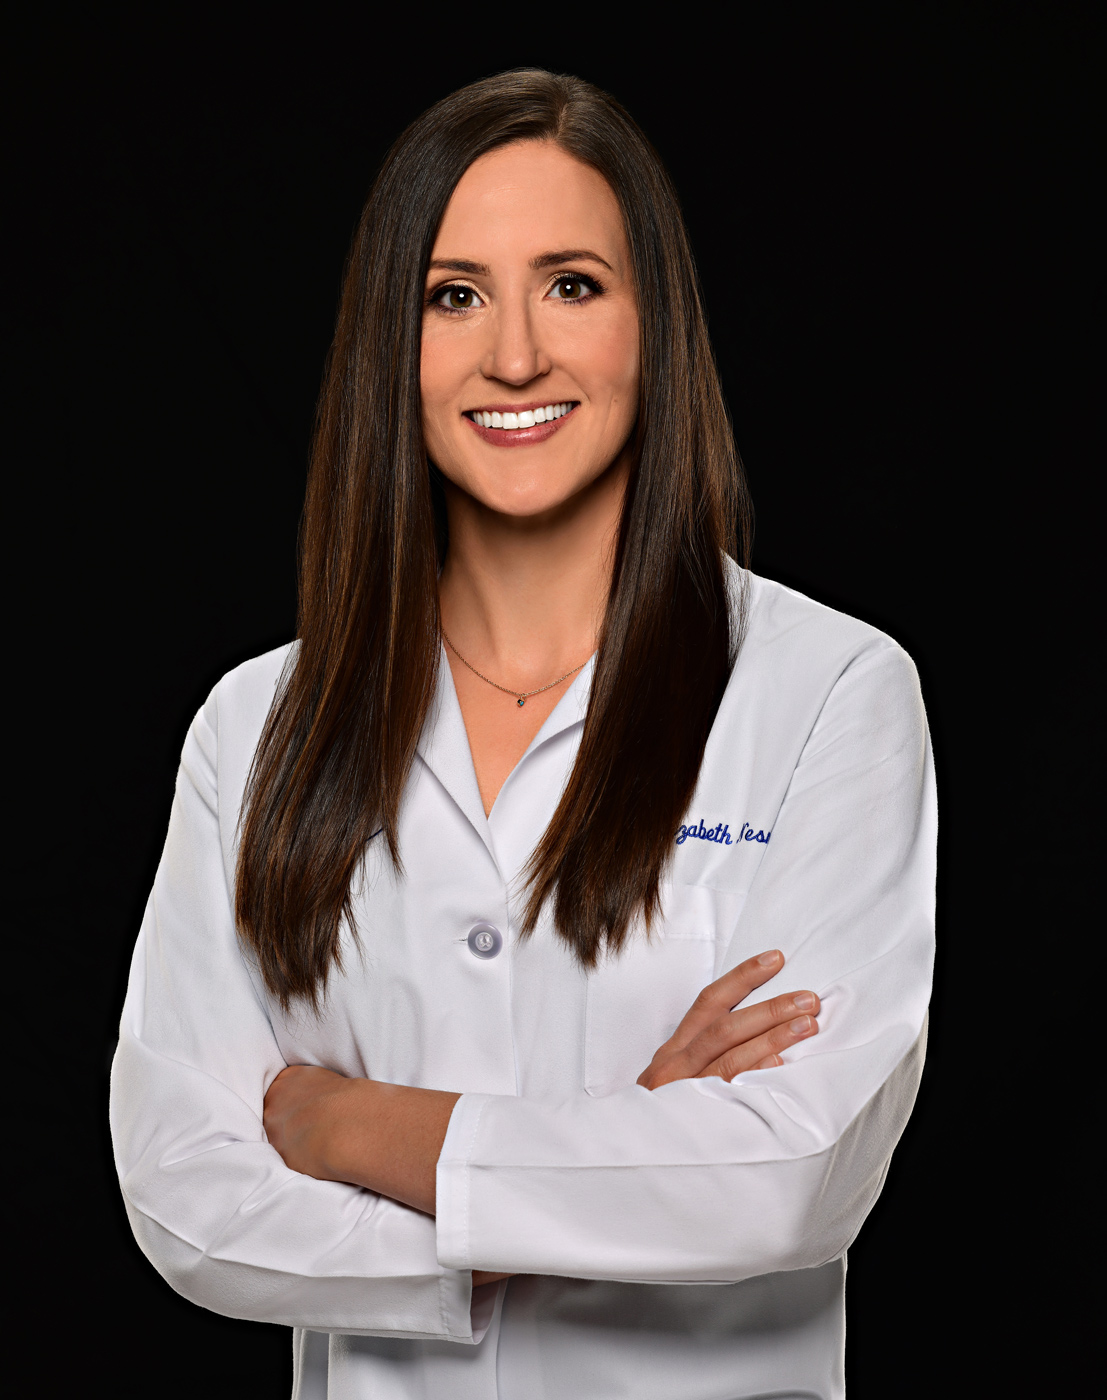 healthcare headshot of oral surgeon doctor dentist